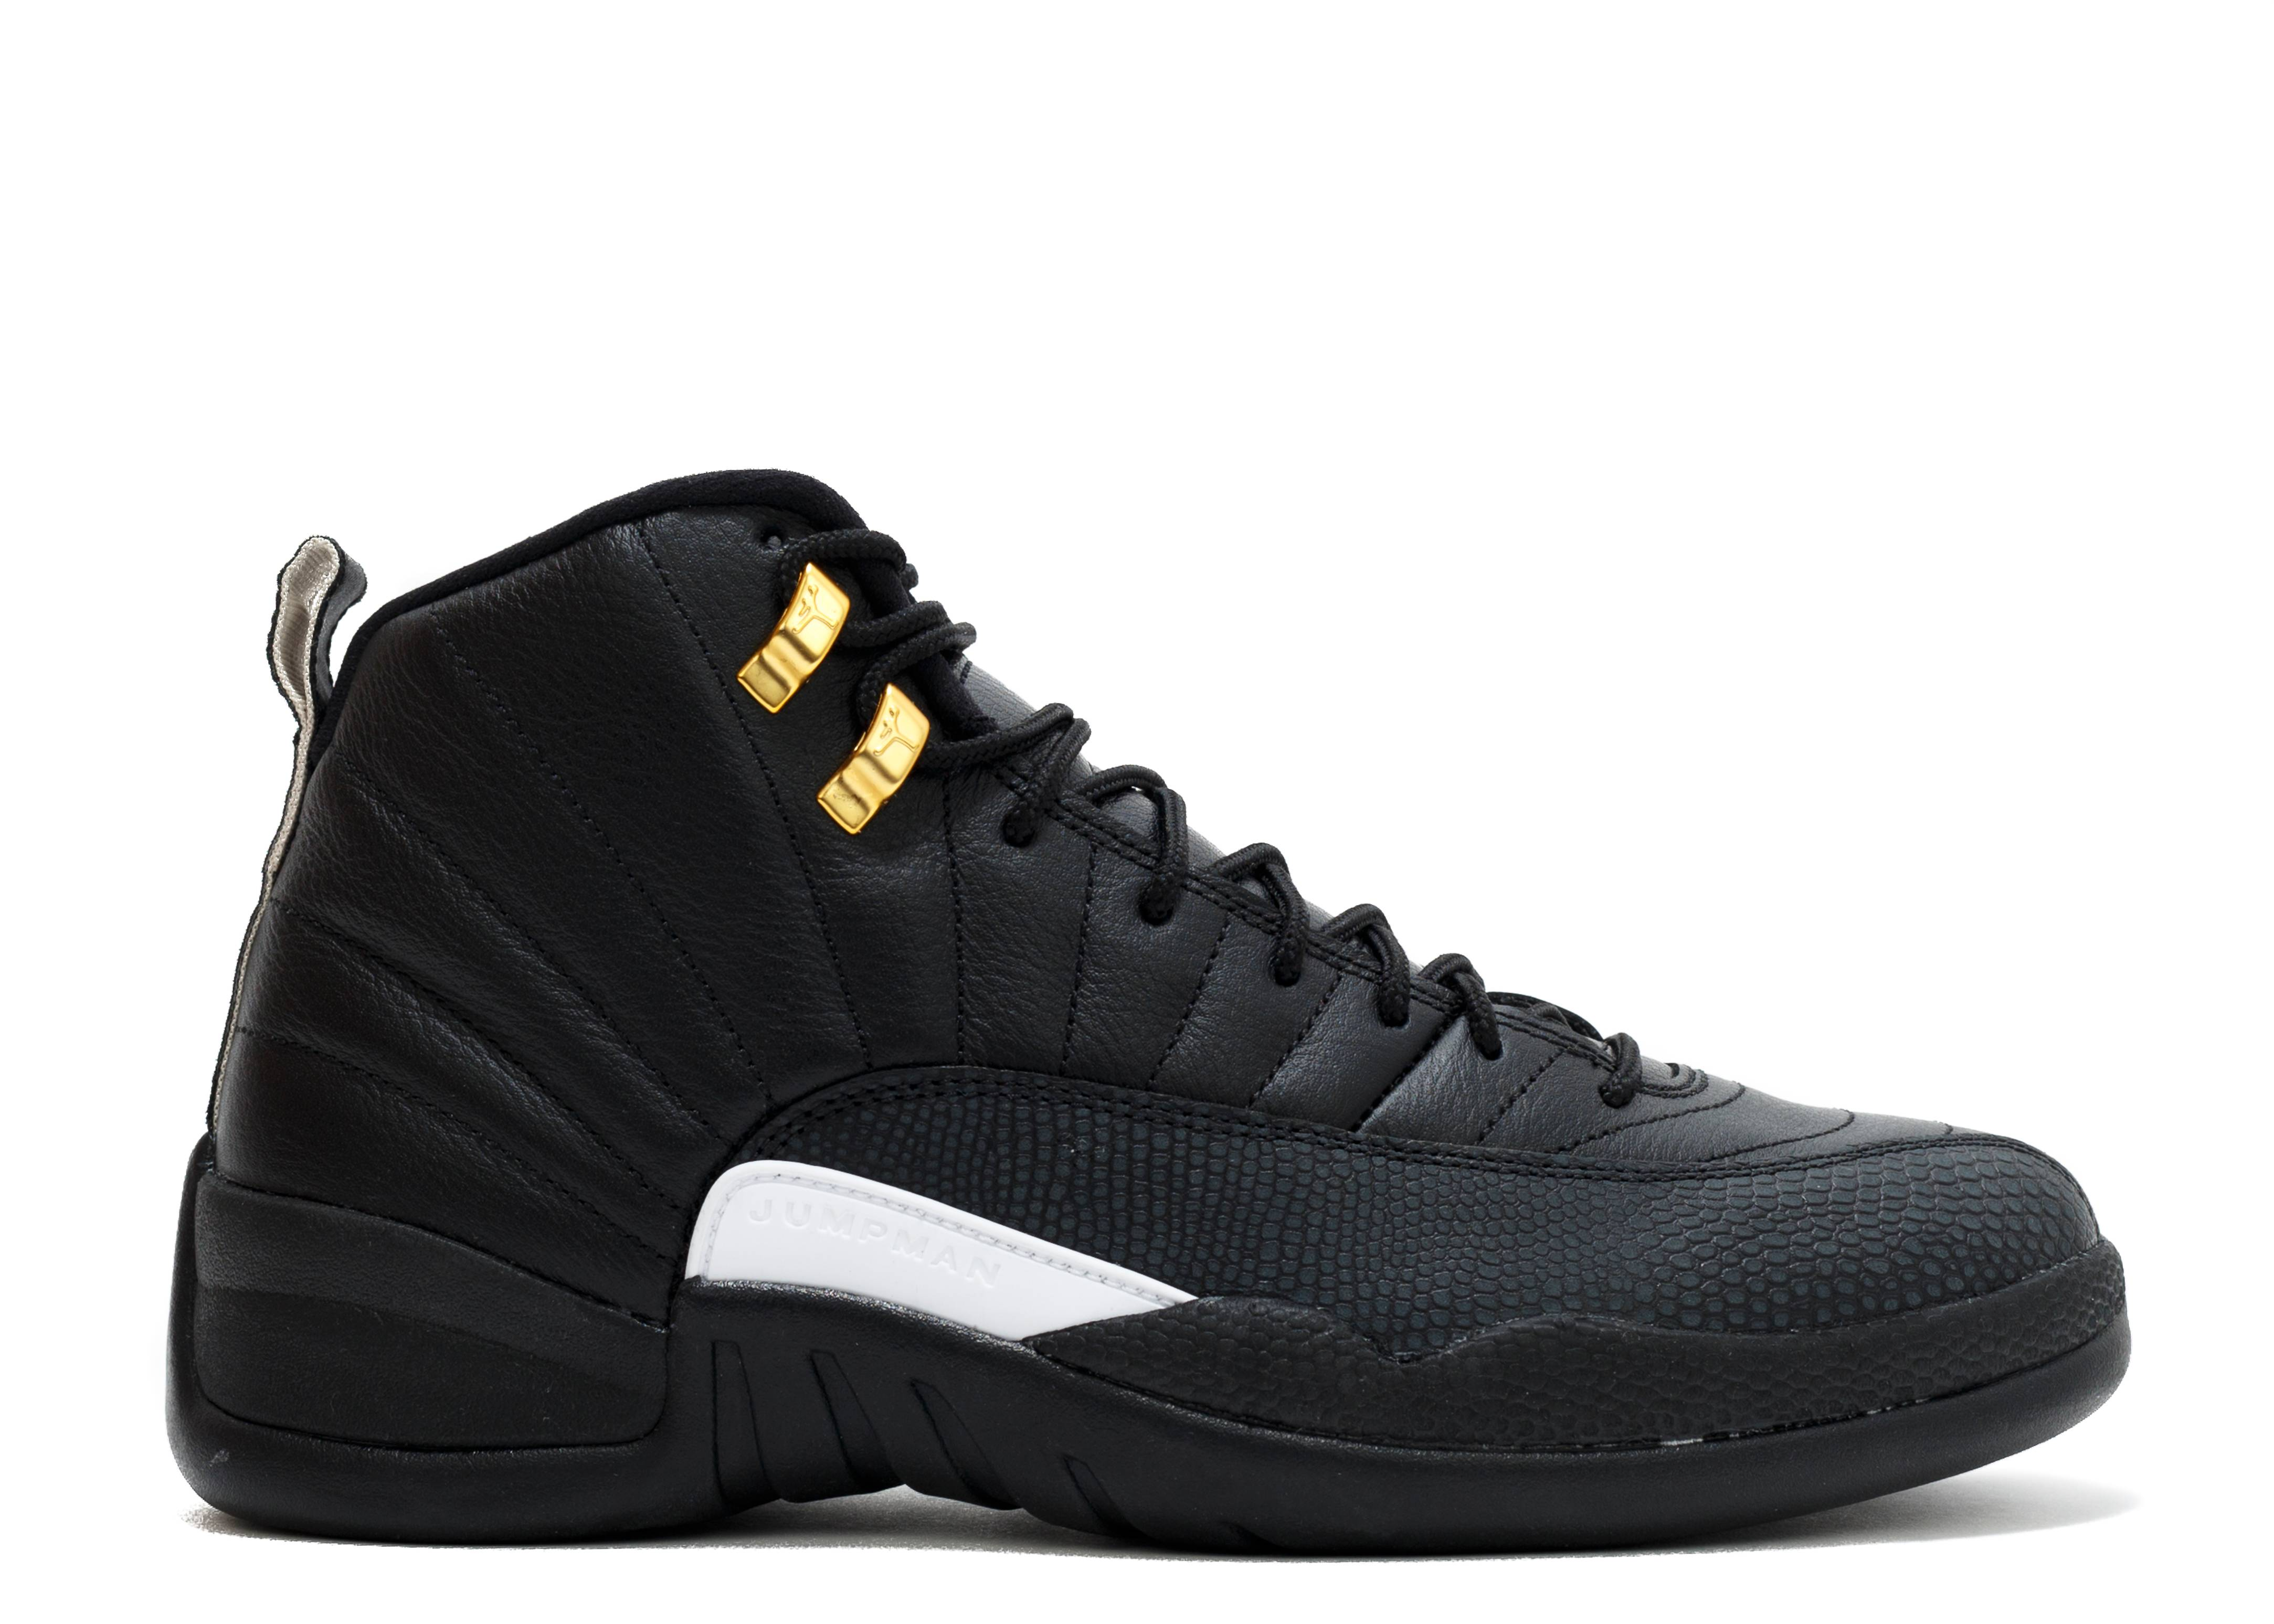 Jordan 12 Ovo